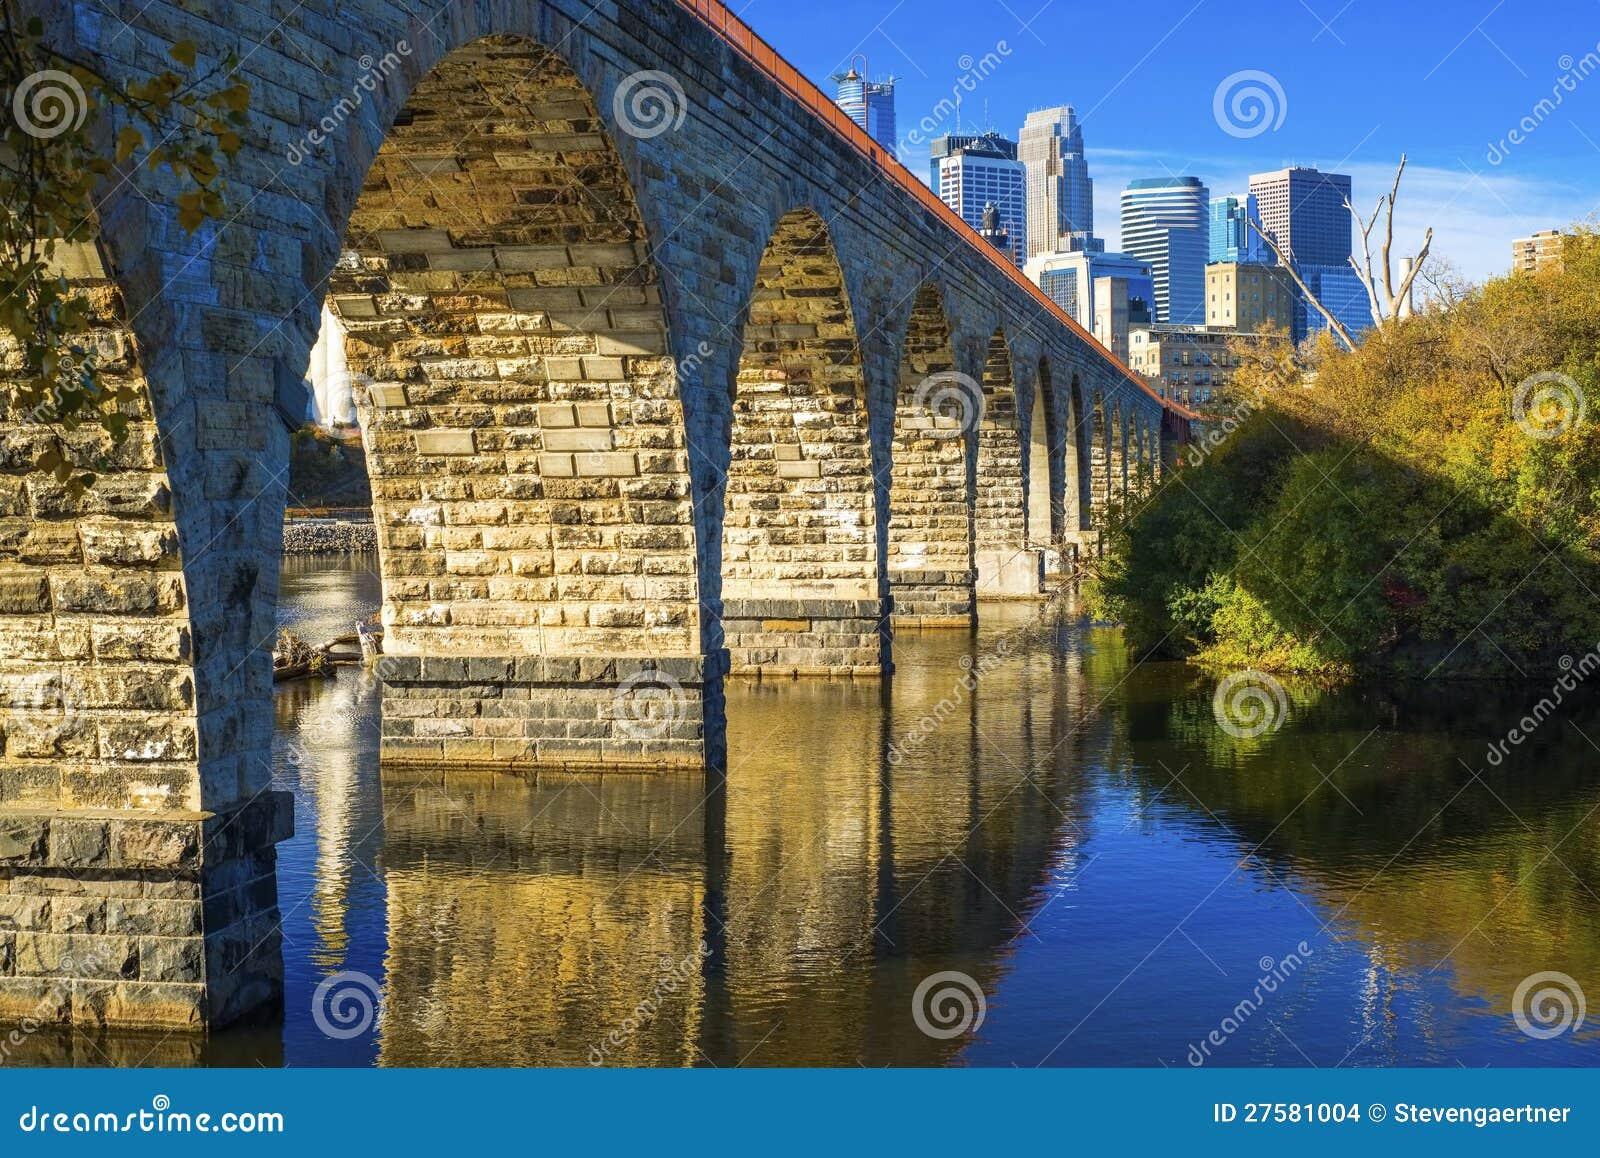 Stone arch bridge, minneapolis skyline